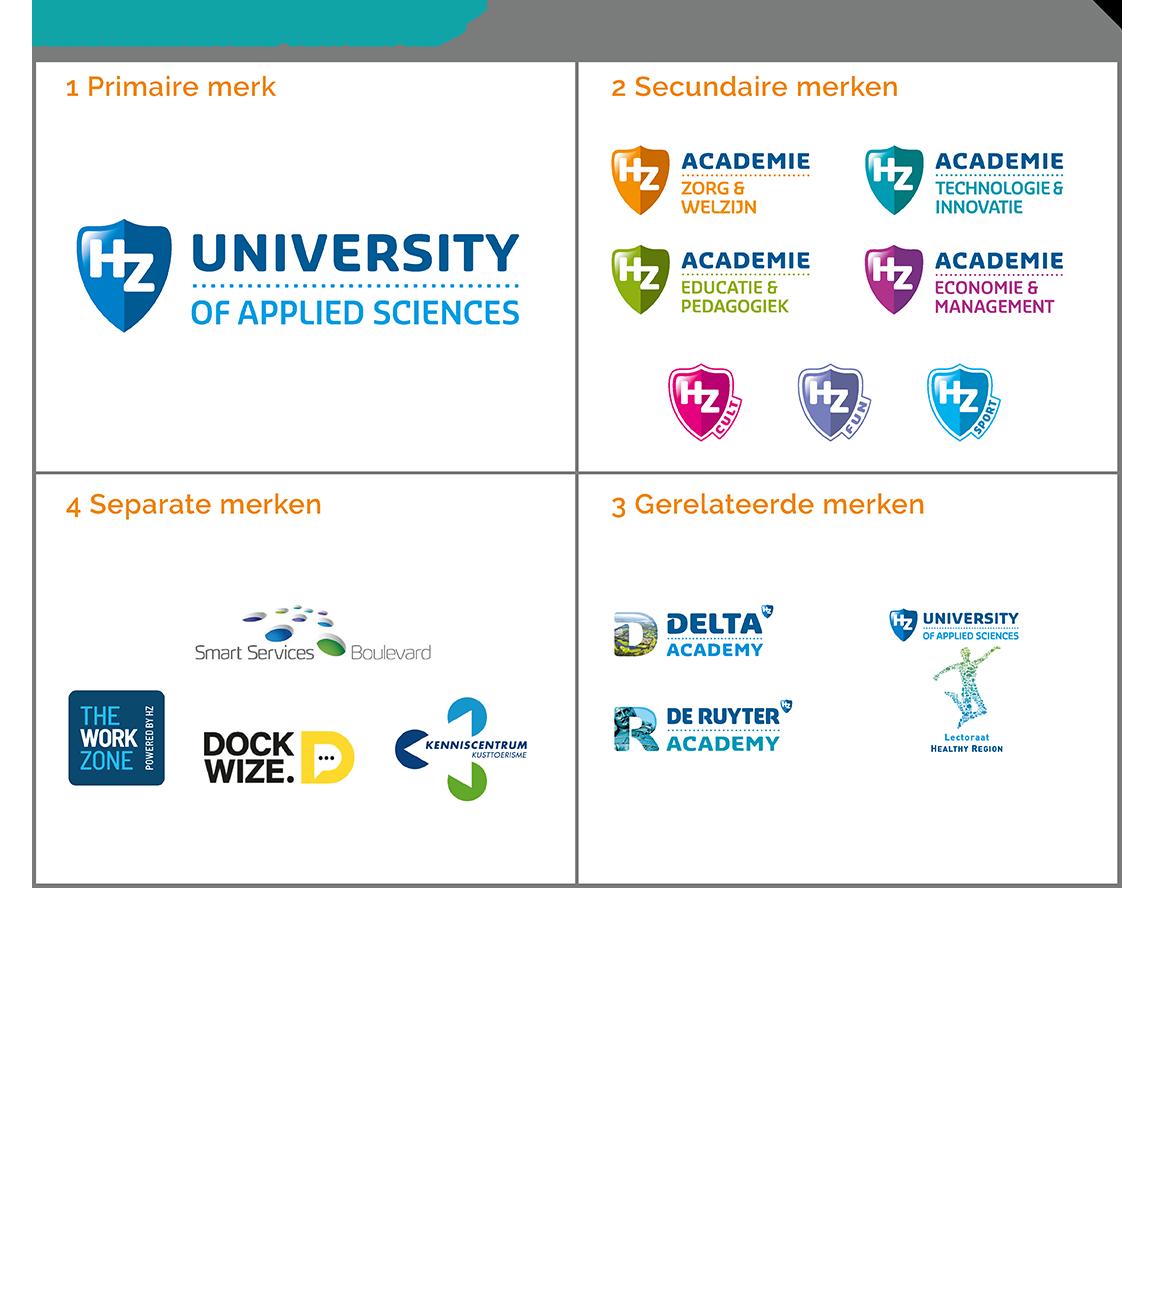 Merk hierarchie matrix Hogeschool Zeeland